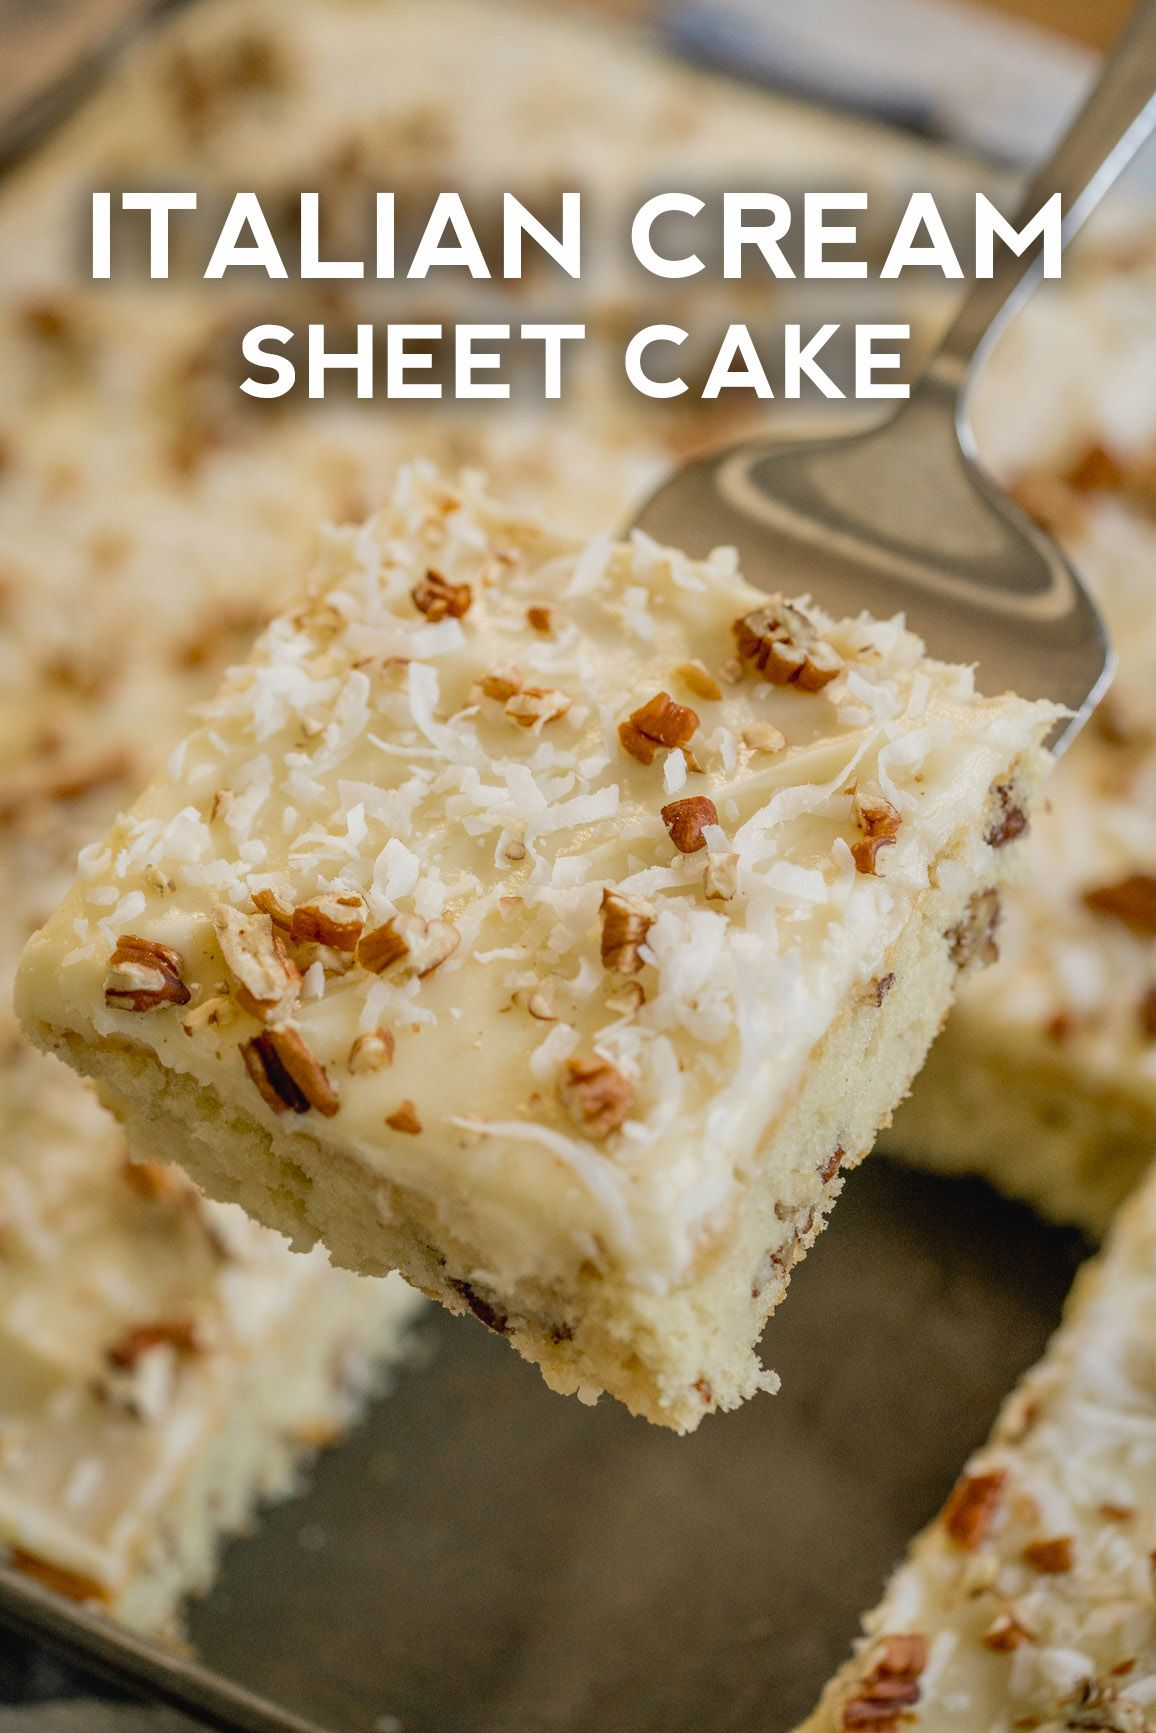 Italian Cream Cake Recipe Dessert Cake Recipes Sheet Cake